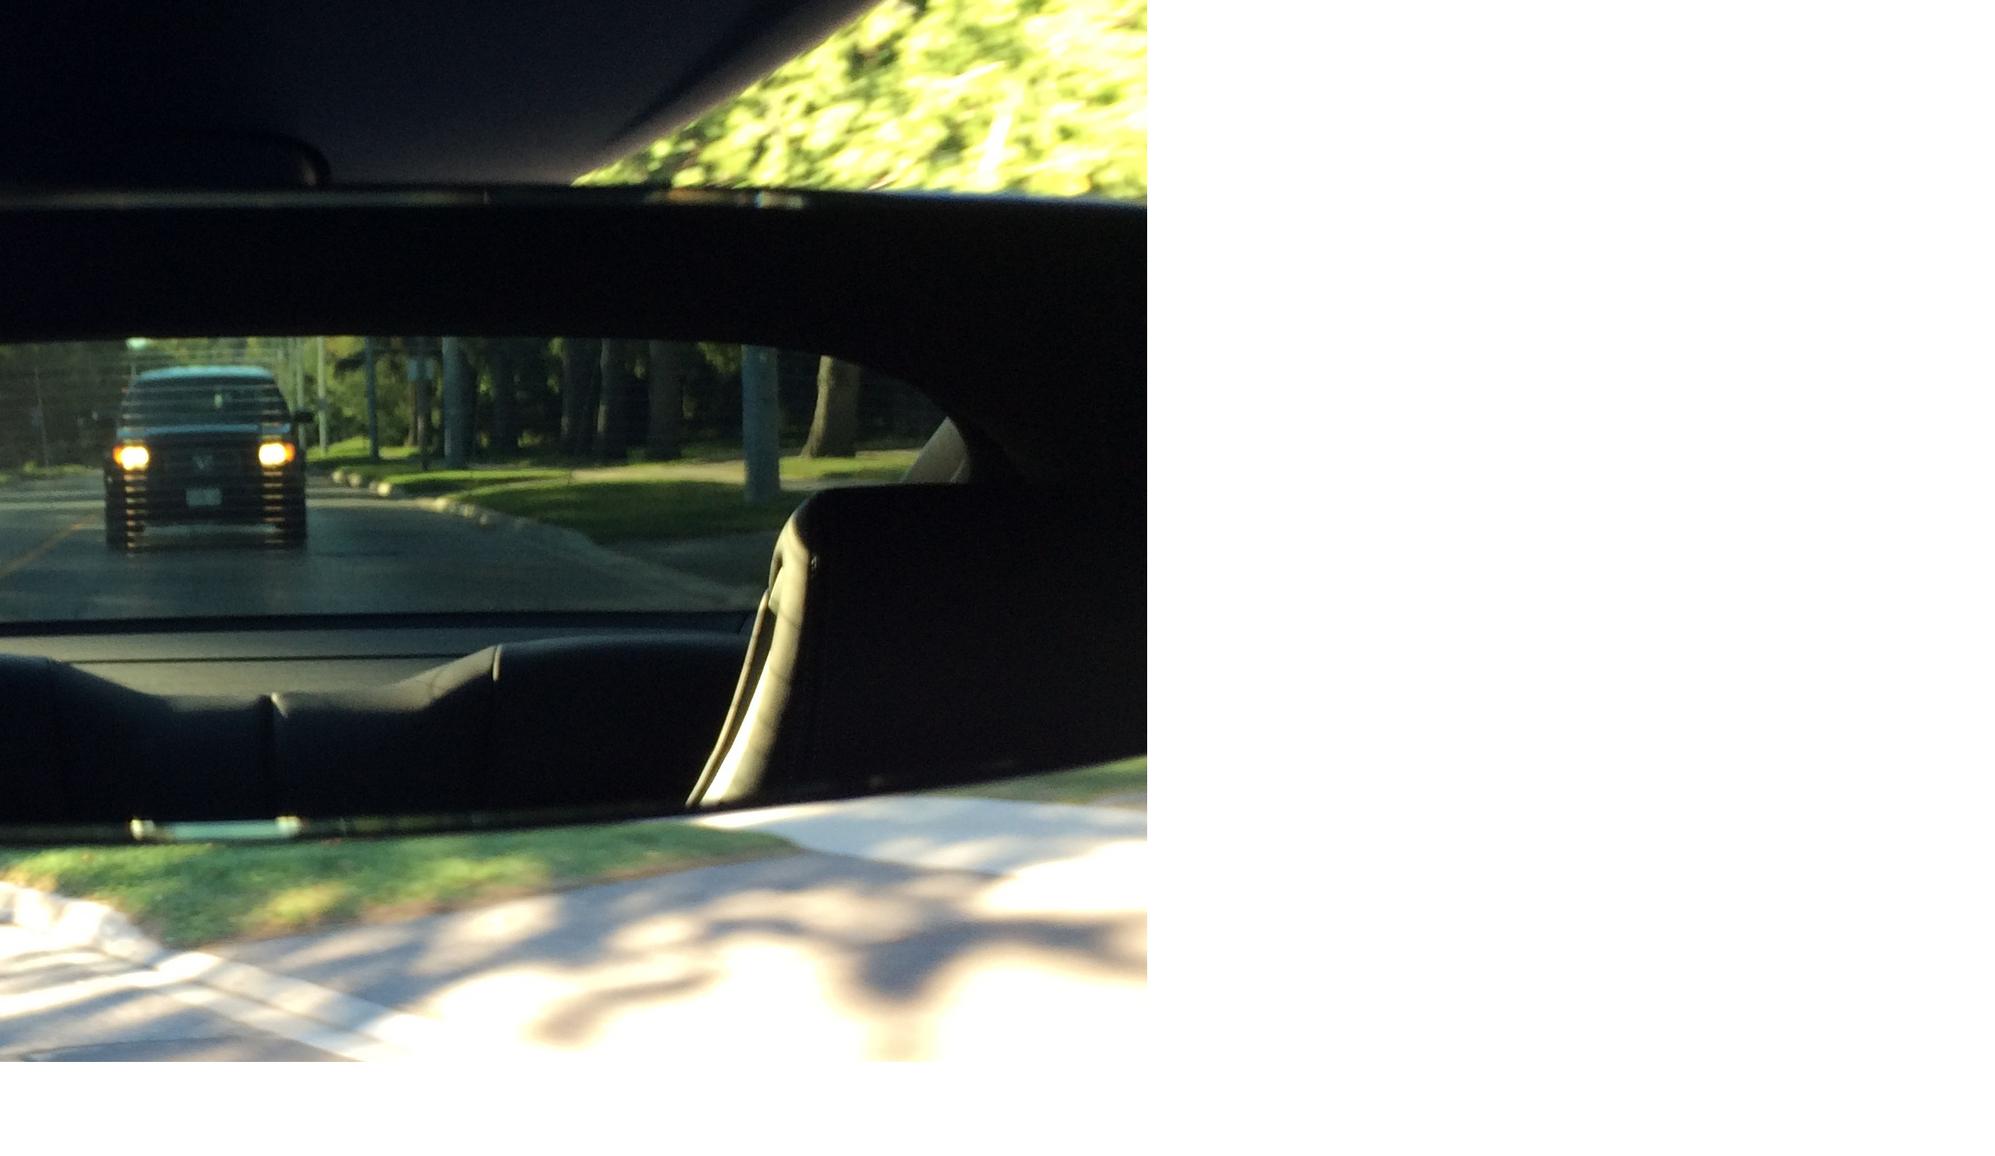 Back Window Tint Headlight Glare - Audiworld Forums